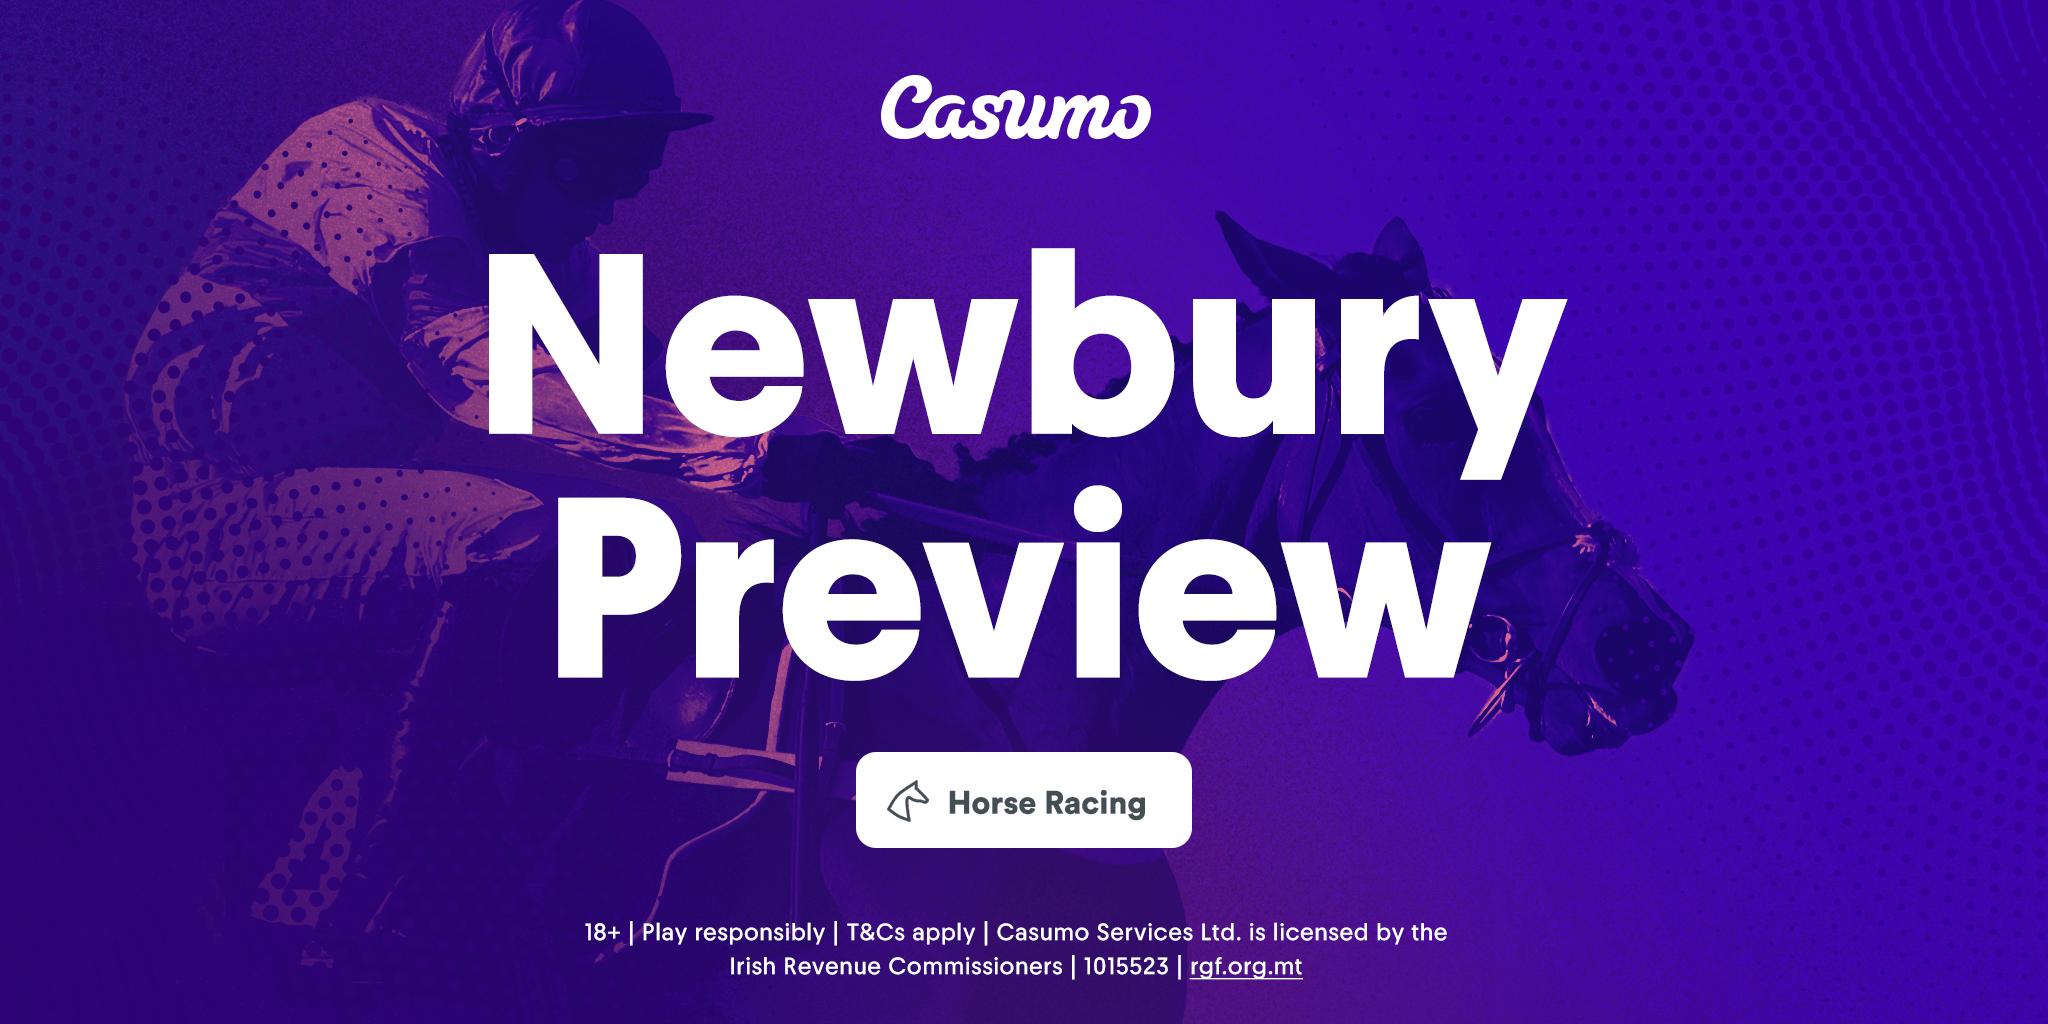 Newbury preview